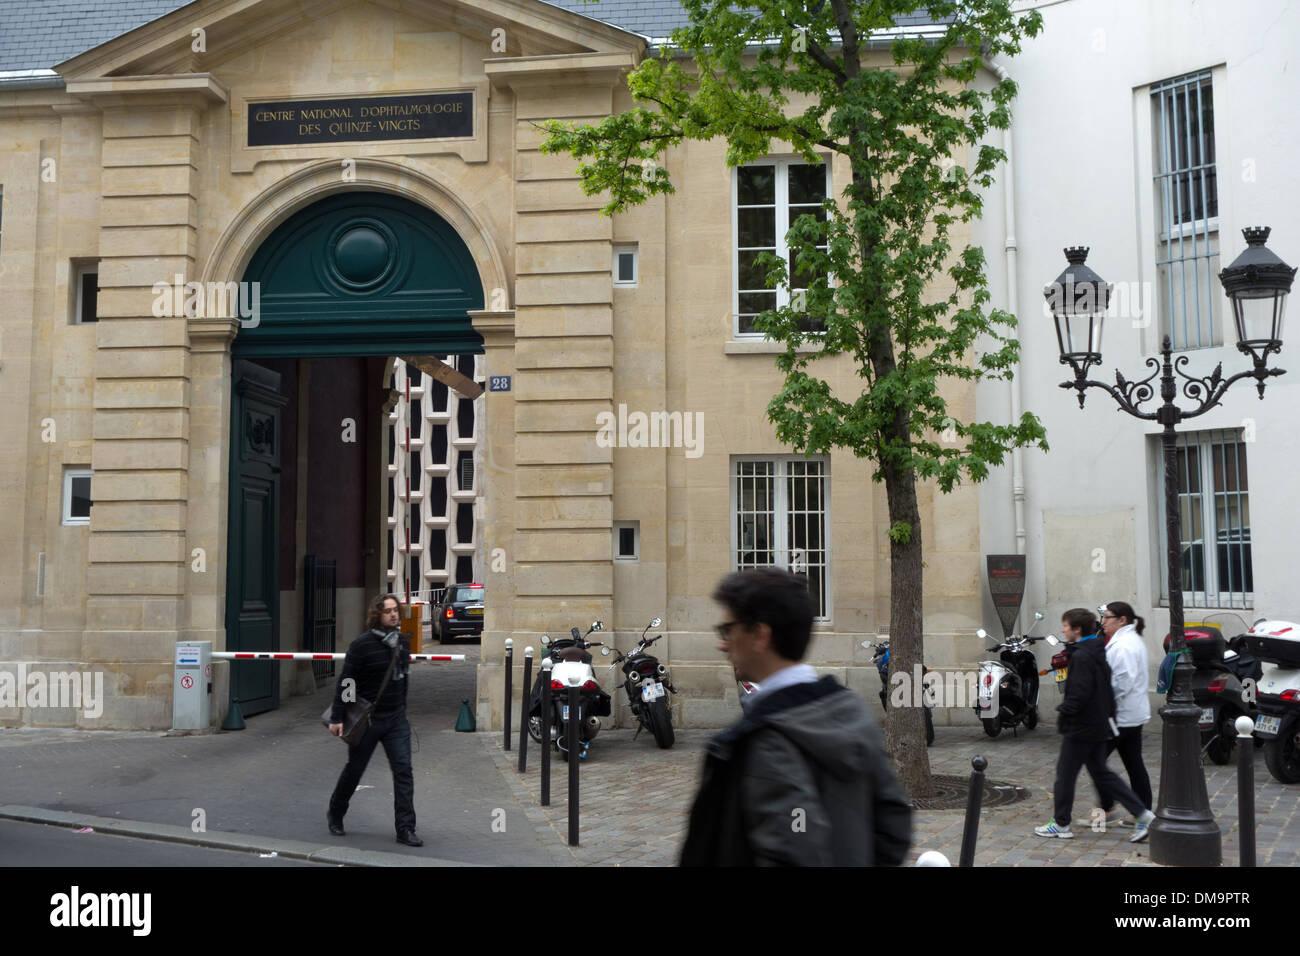 ENTRANCE TO THE NATIONAL OPHTHALMOLOGY HOSPITAL DES QUINZE-VINGT, HOSPITAL ON 15-20, RUE DE CHARENTON, 12TH ARRONDISSEMENT, PARIS, FRANCE - Stock Image